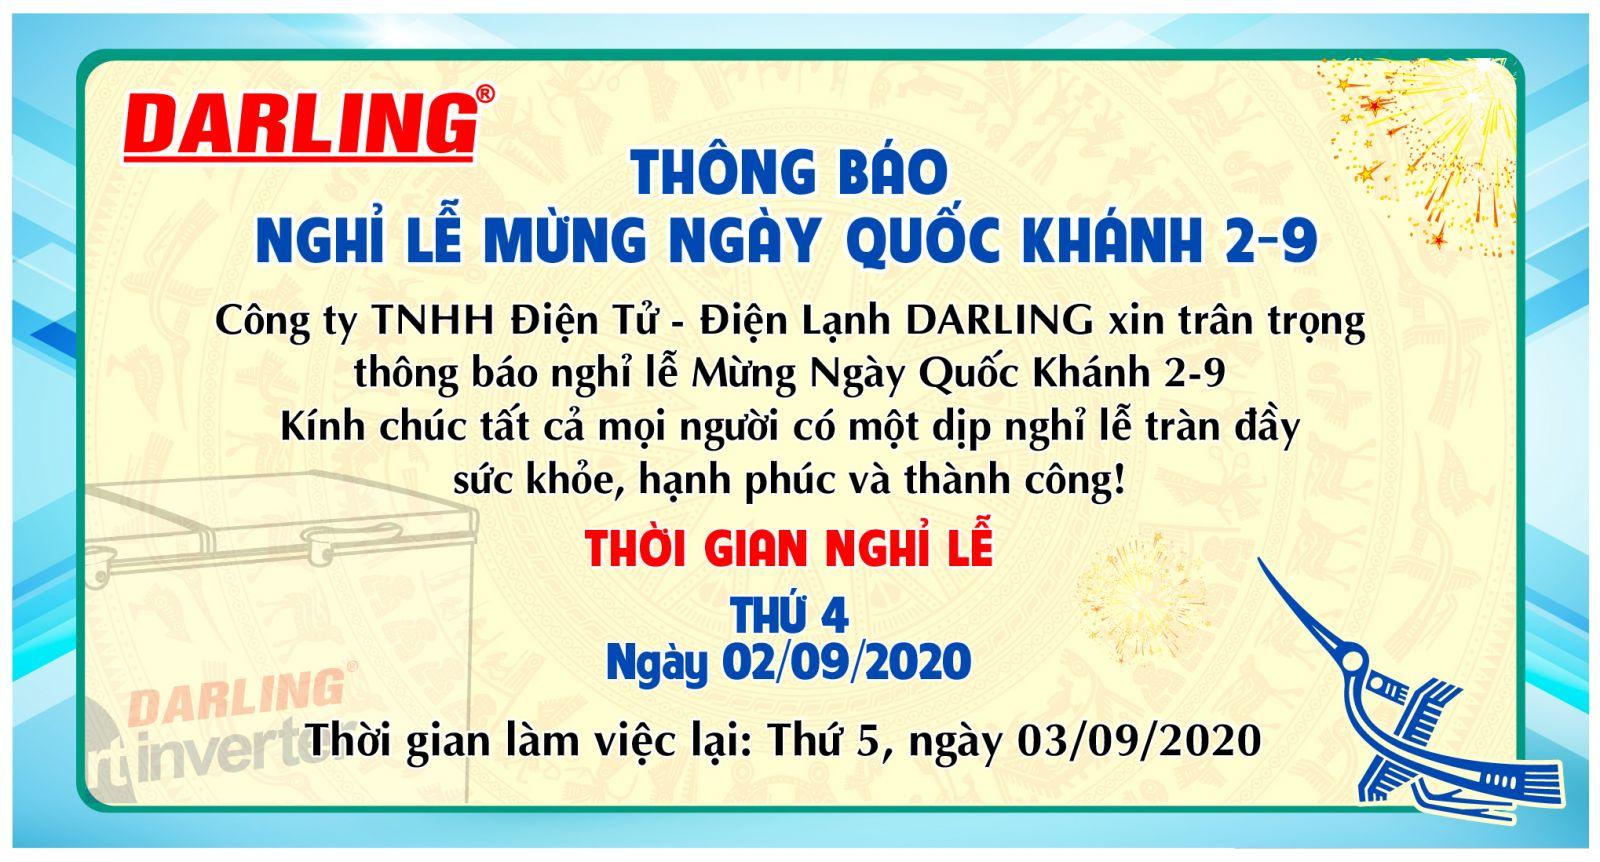 darling mung quoc khach 2-9